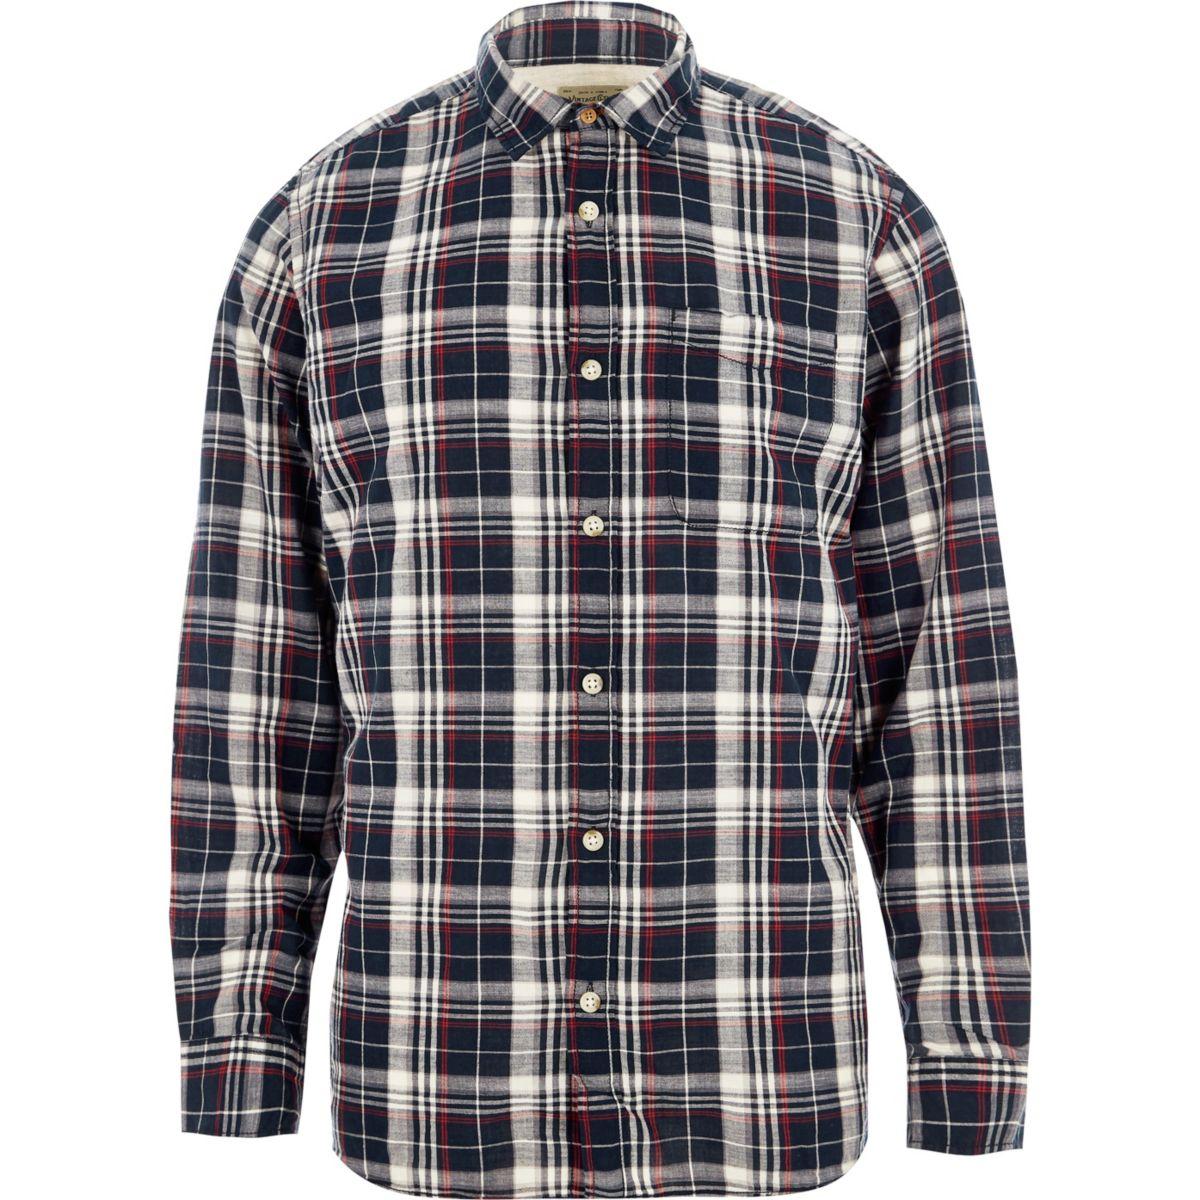 Navy Jack & Jones Vintage check shirt